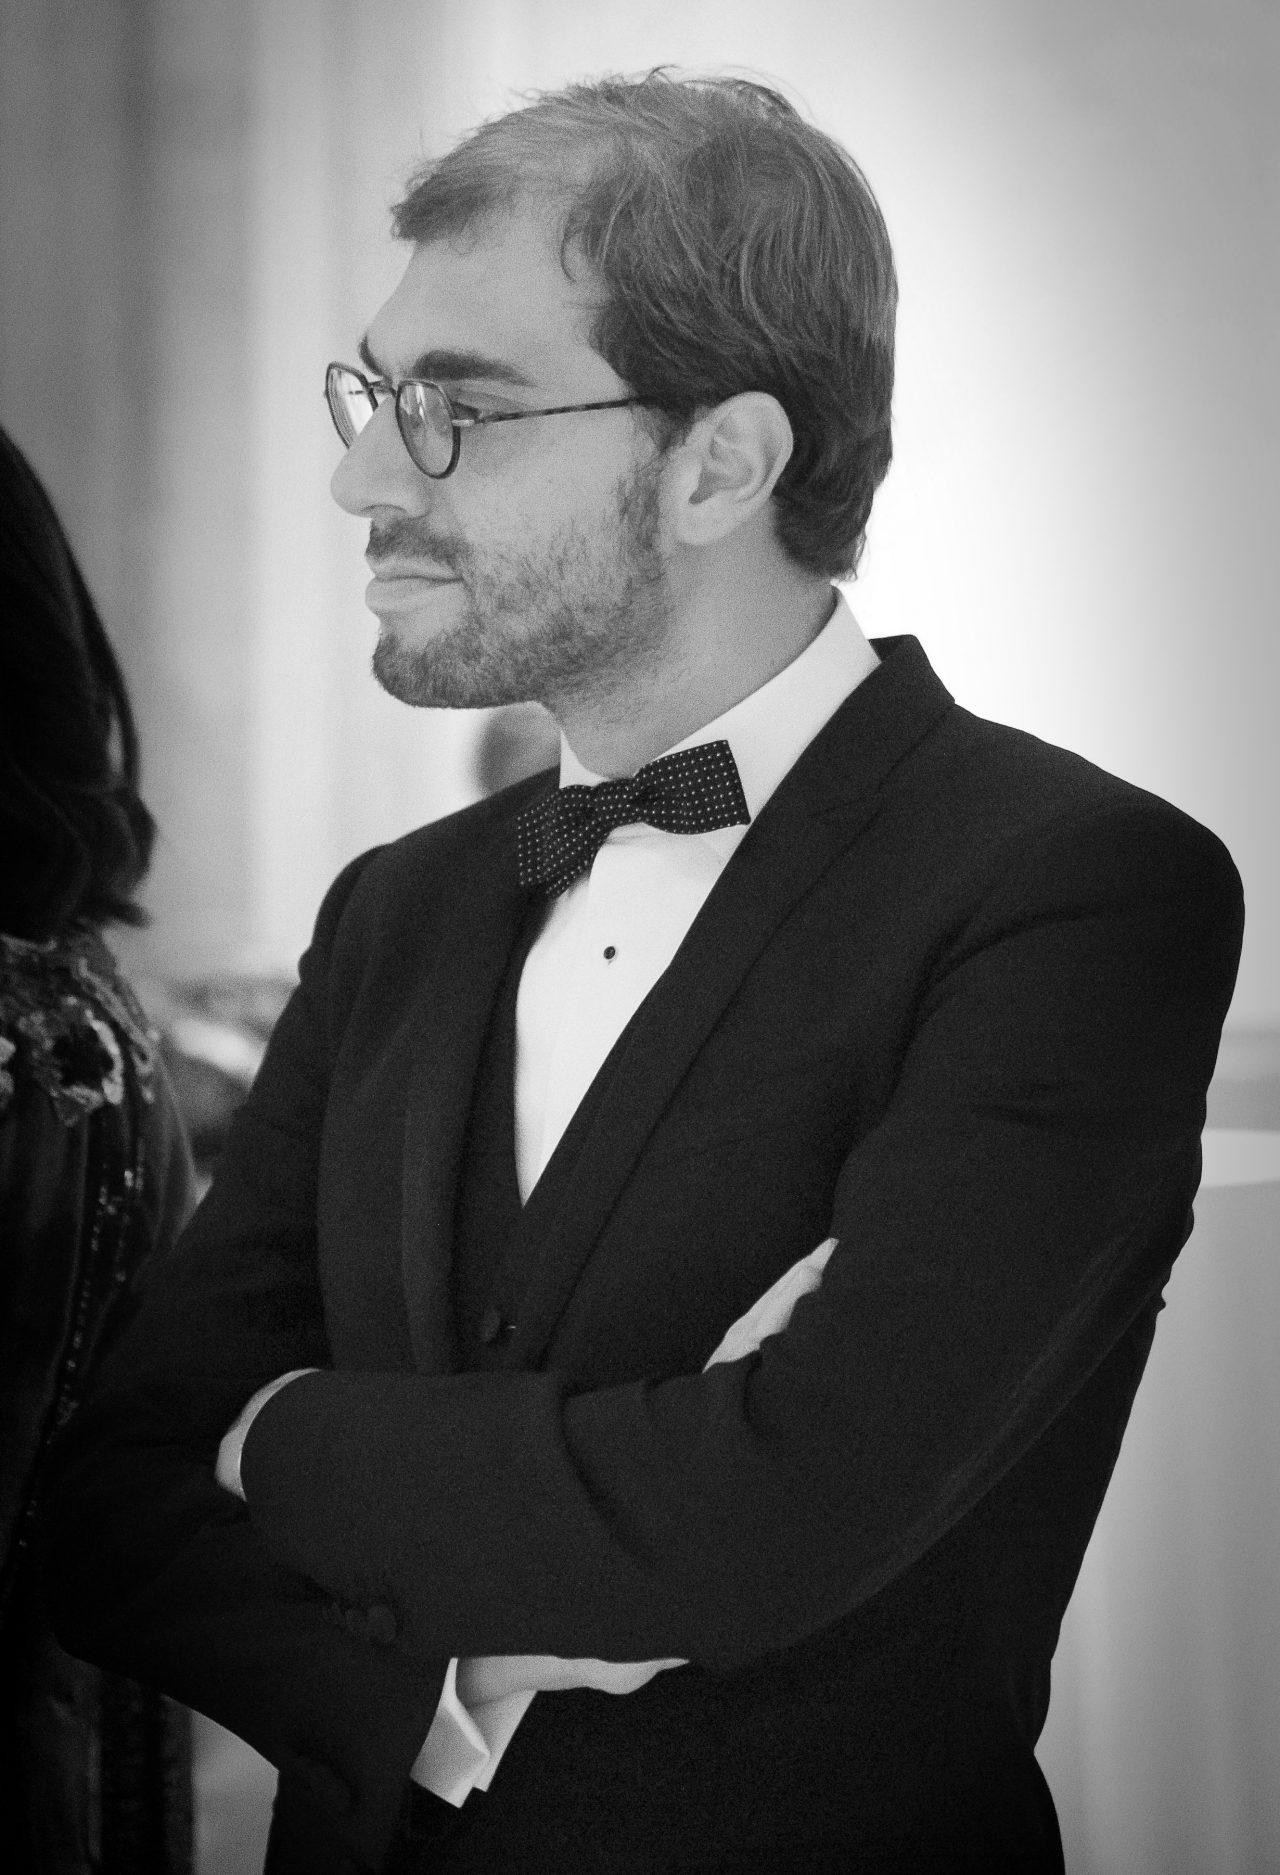 Avv. Enrico Moretti Polegato, Presidente Diadora